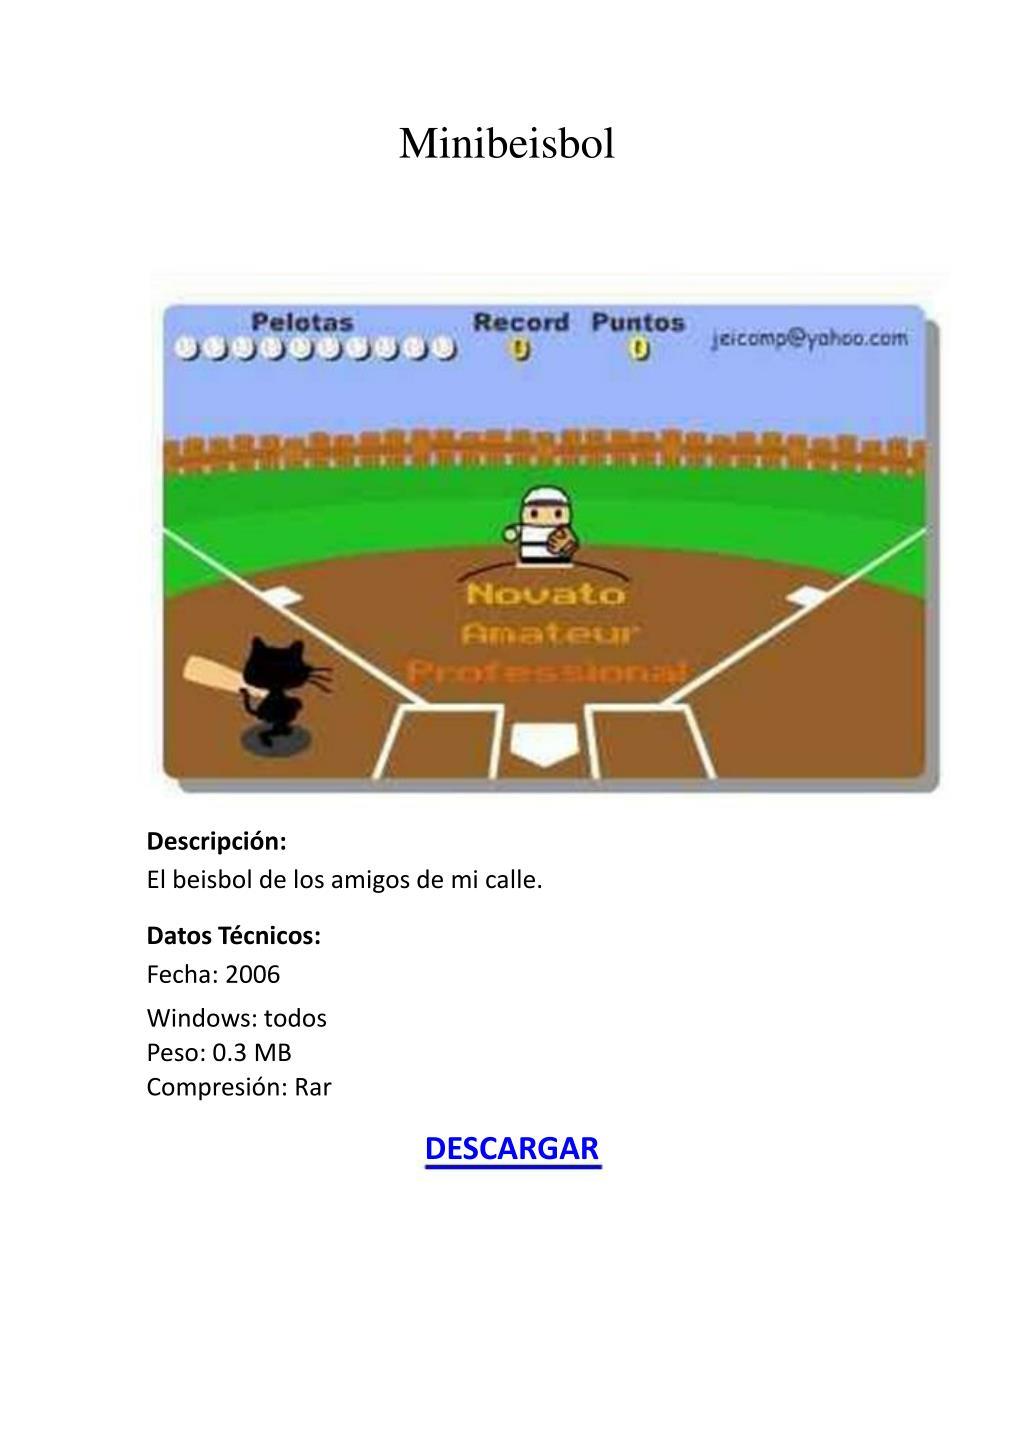 Minibeisbol